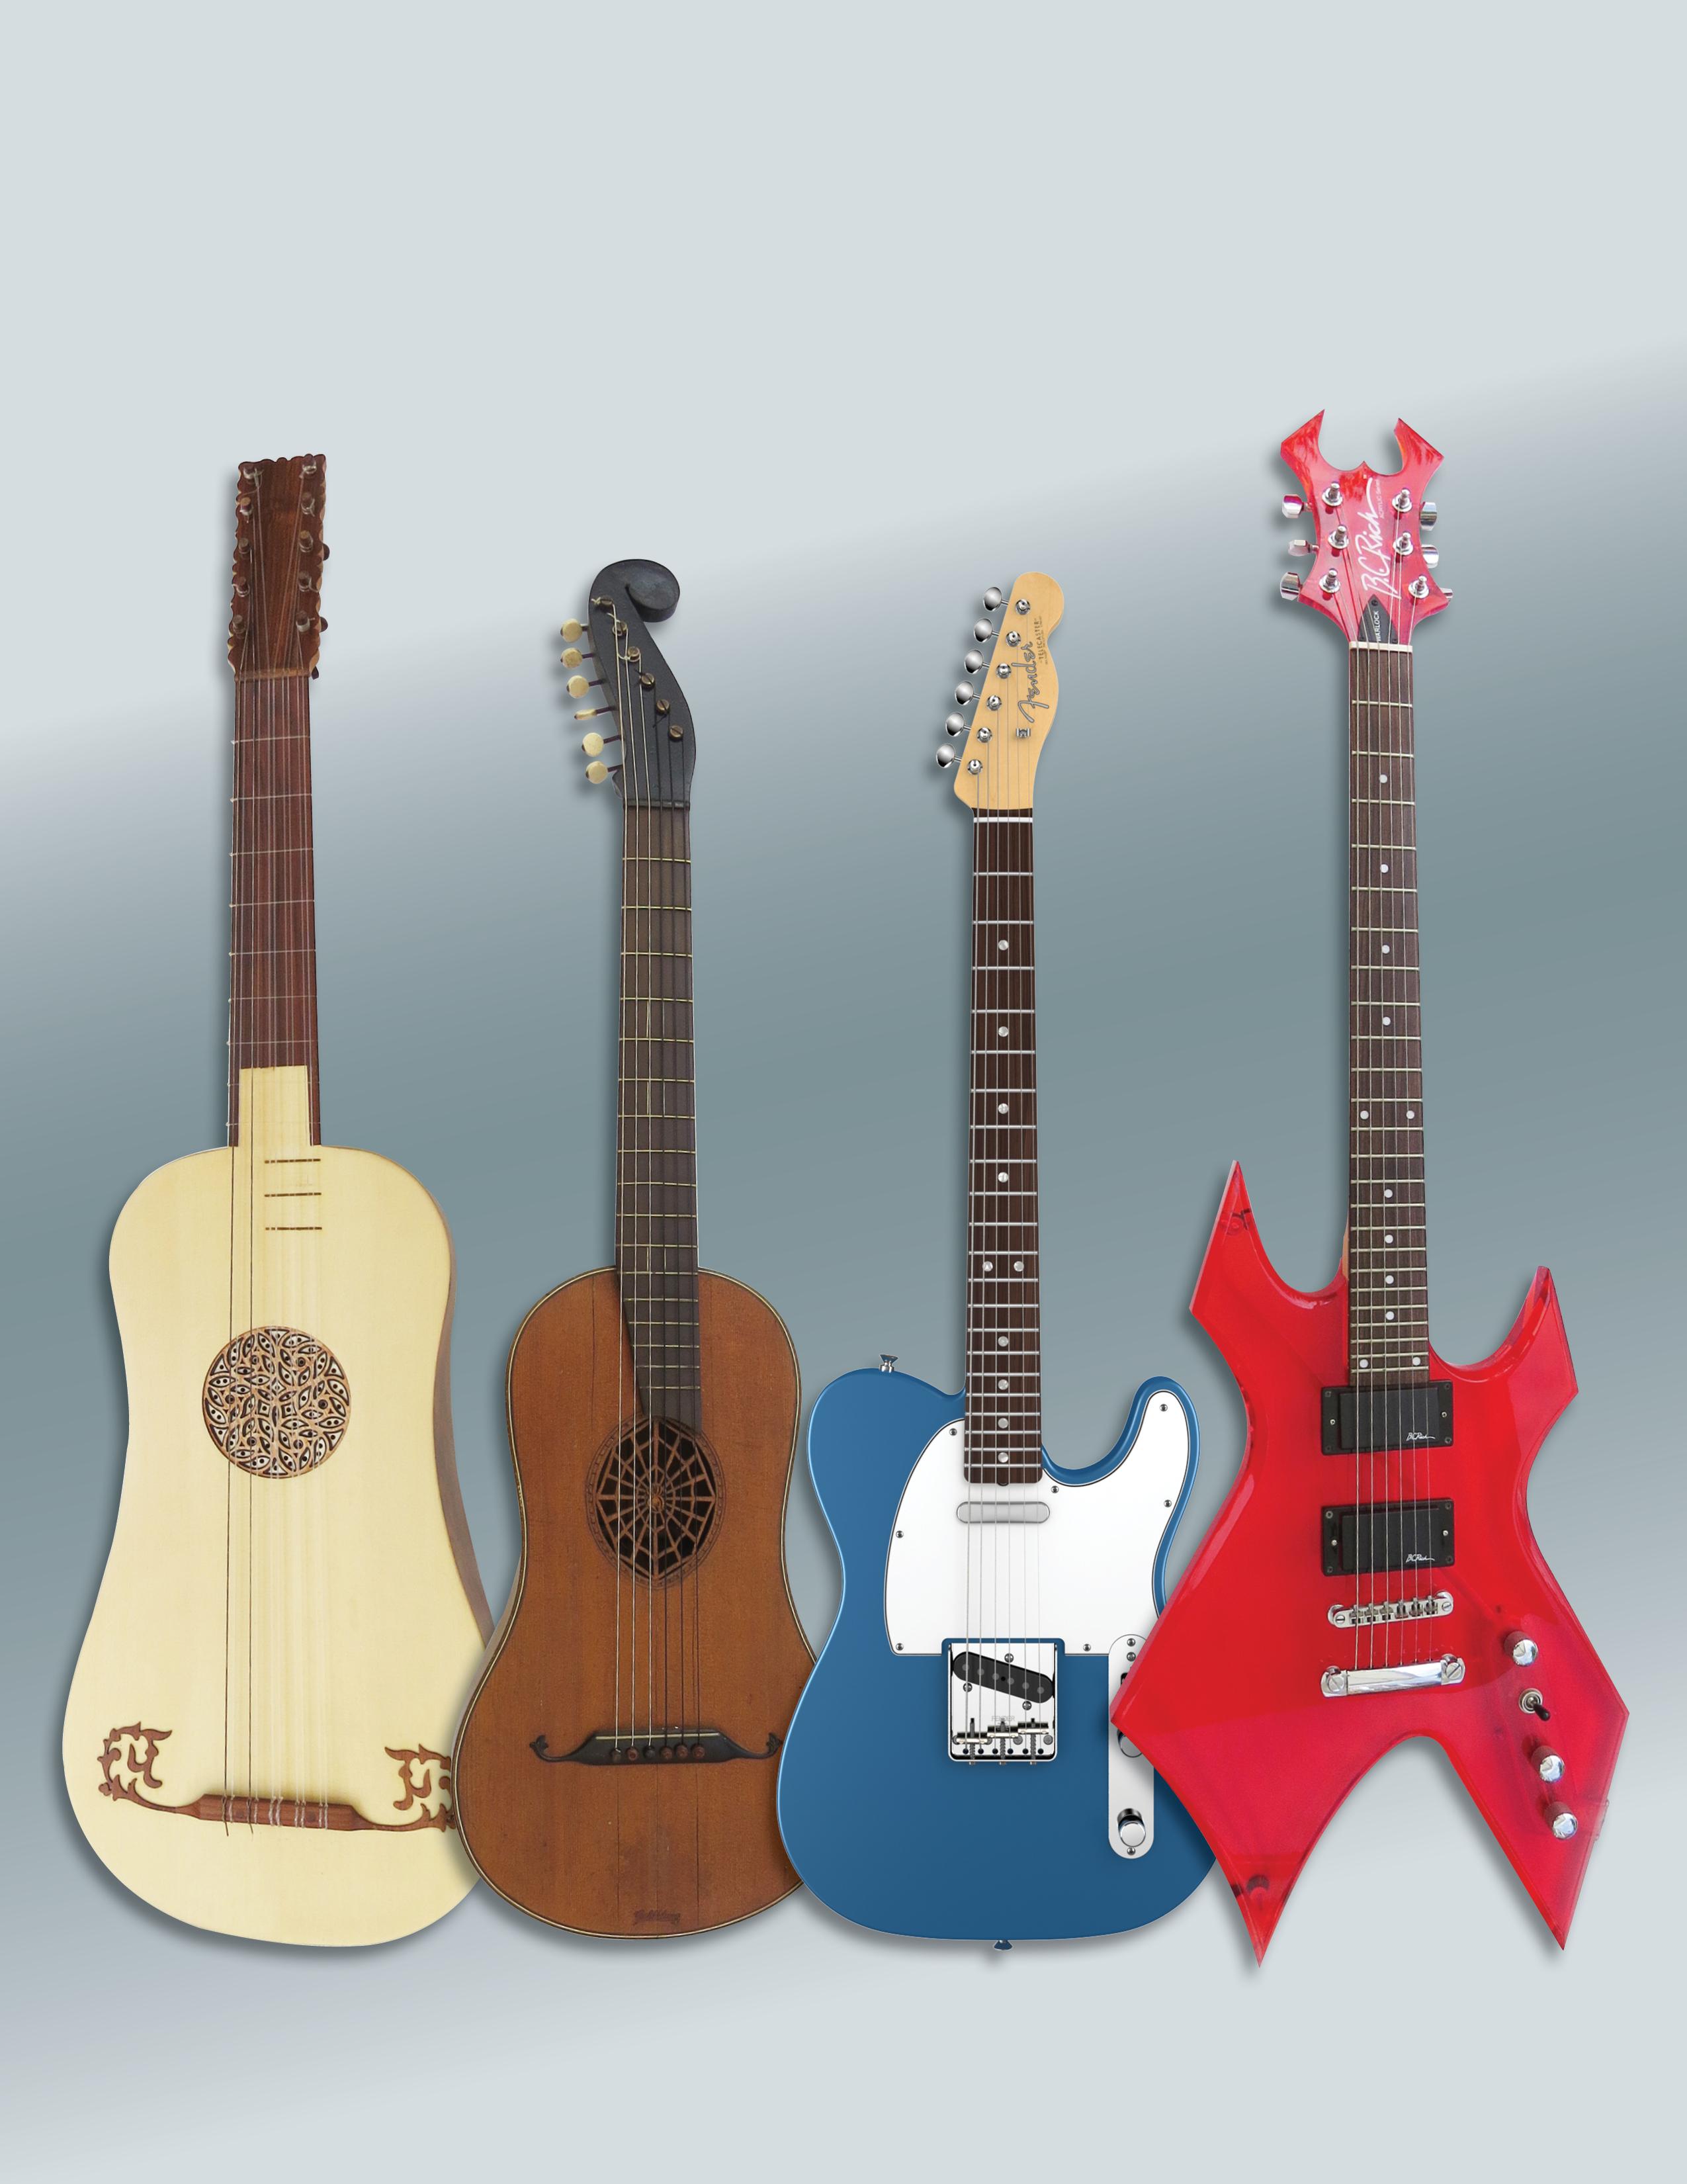 Guitar Lineup Image